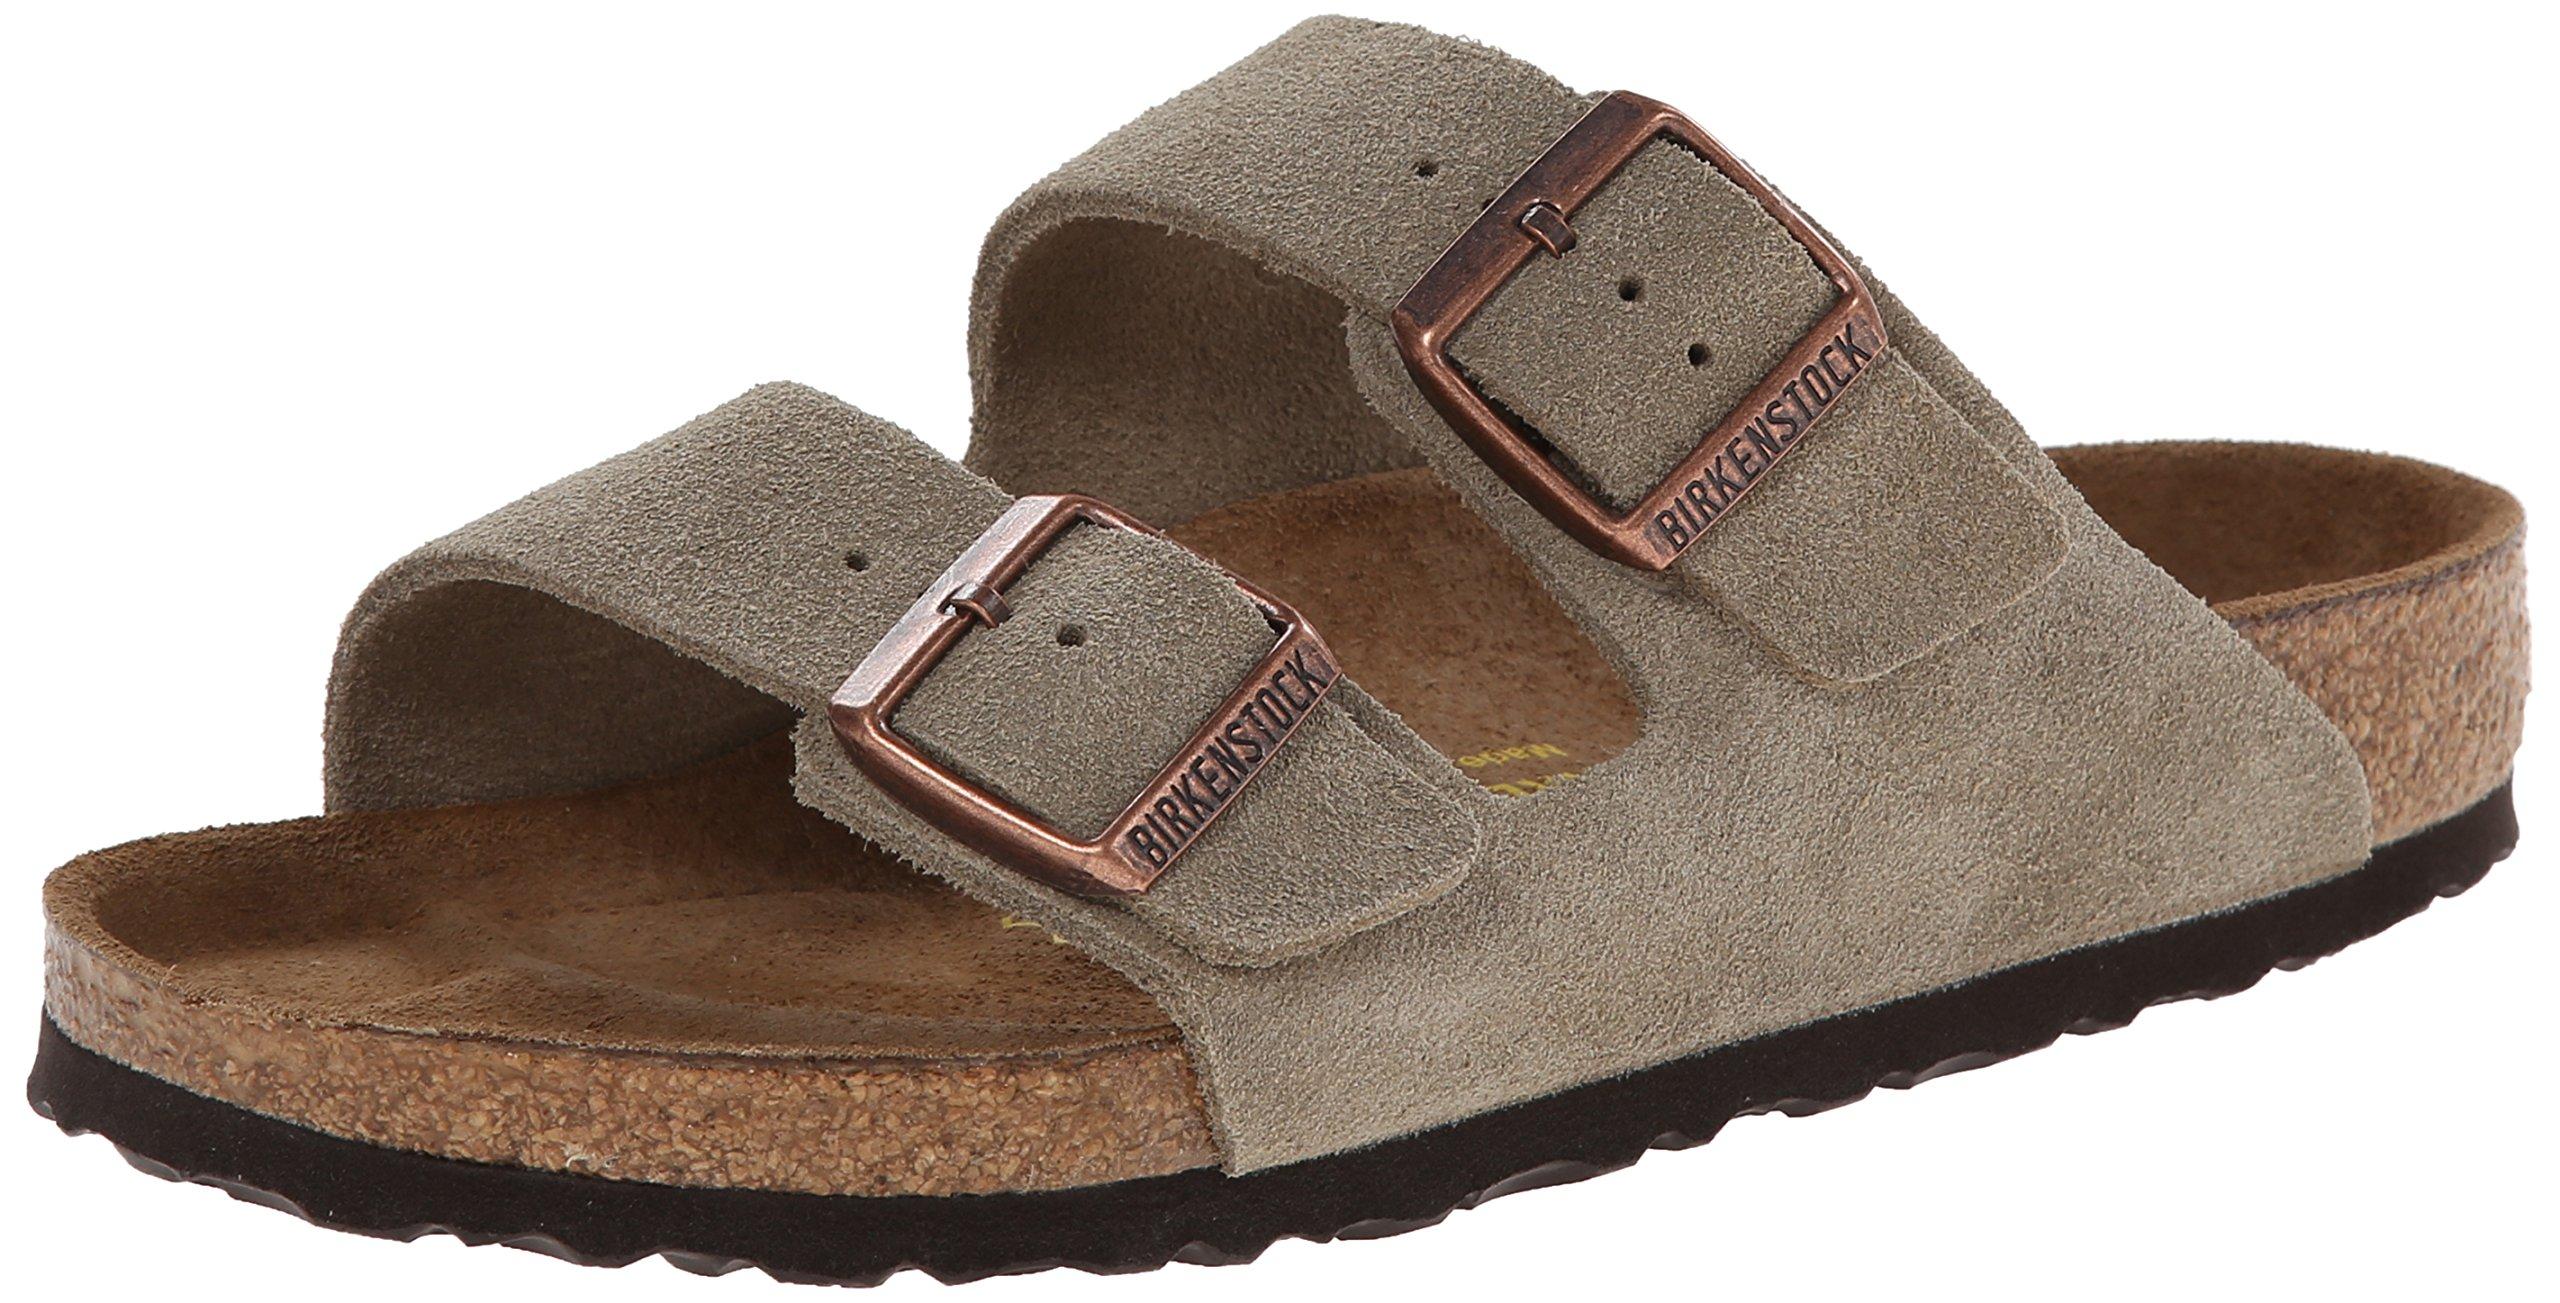 Birkenstock Unisex Arizona Taupe Suede Sandals - 43 N EU/10-10.5 2A(N) US Men by Birkenstock